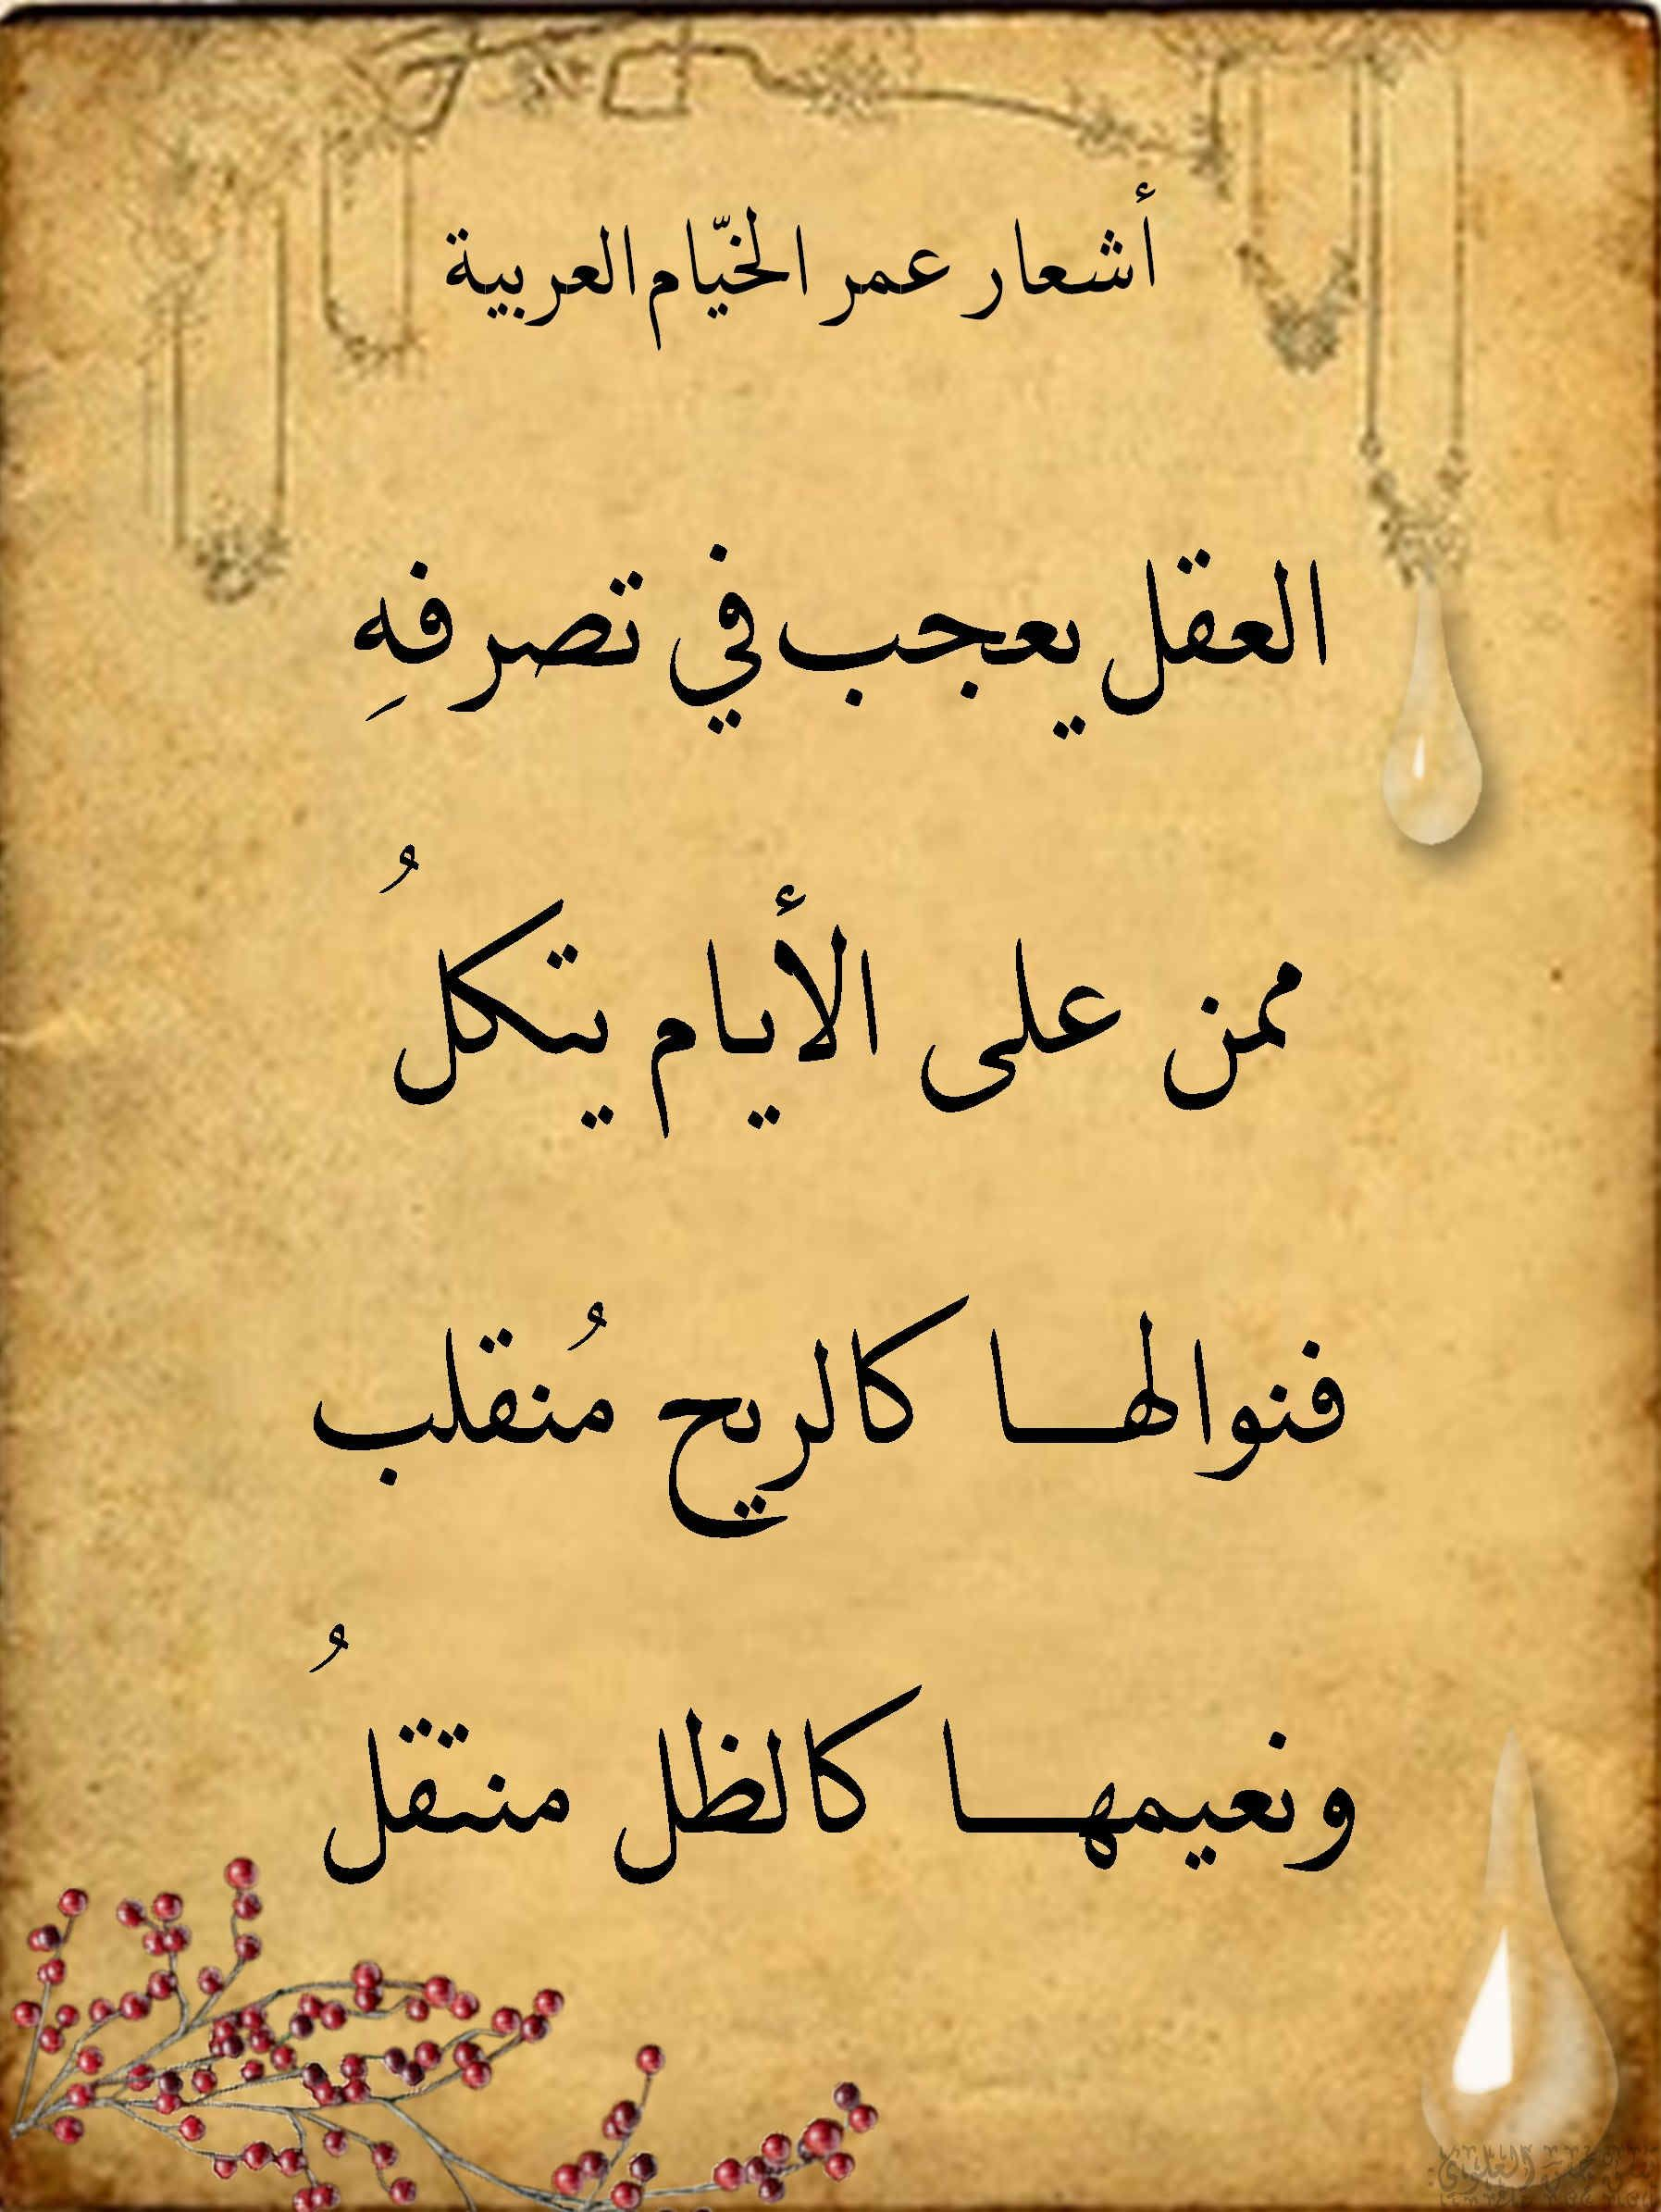 أشعار عمر الخی ام العربیة Wisdom Poetry Arabic Calligraphy